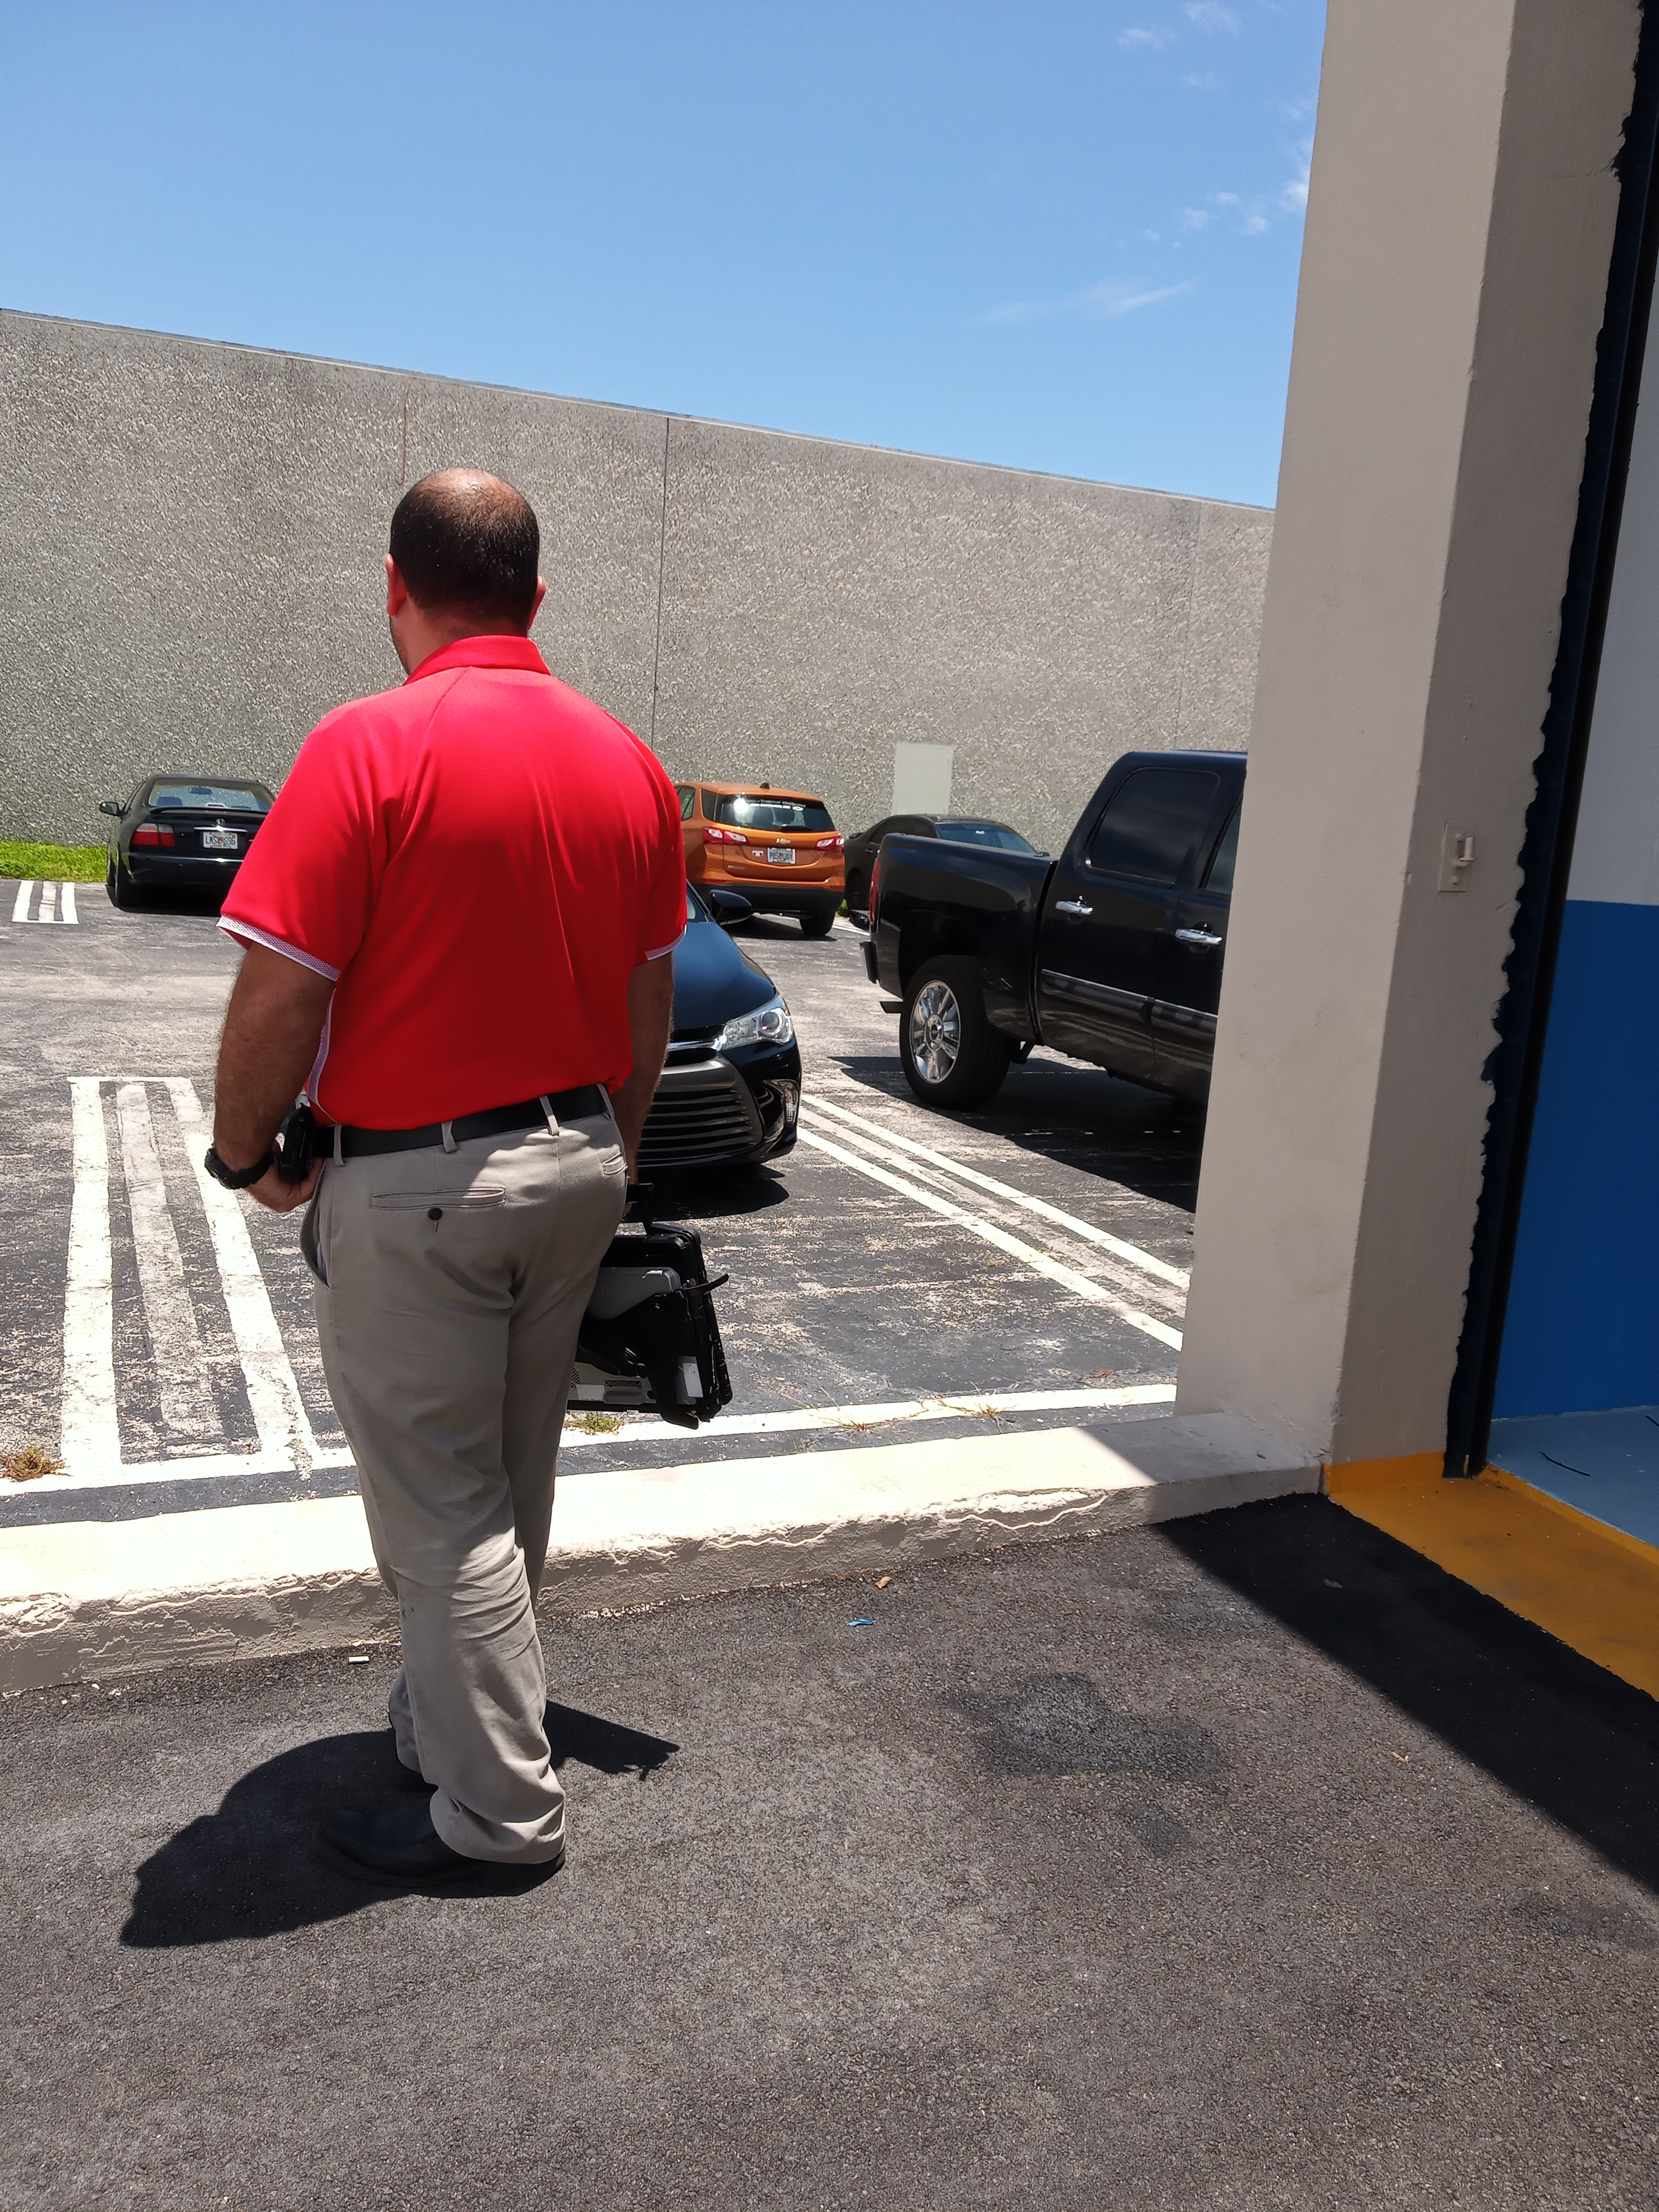 Chevrolet Customer Service Complaints Department | HissingKitty com